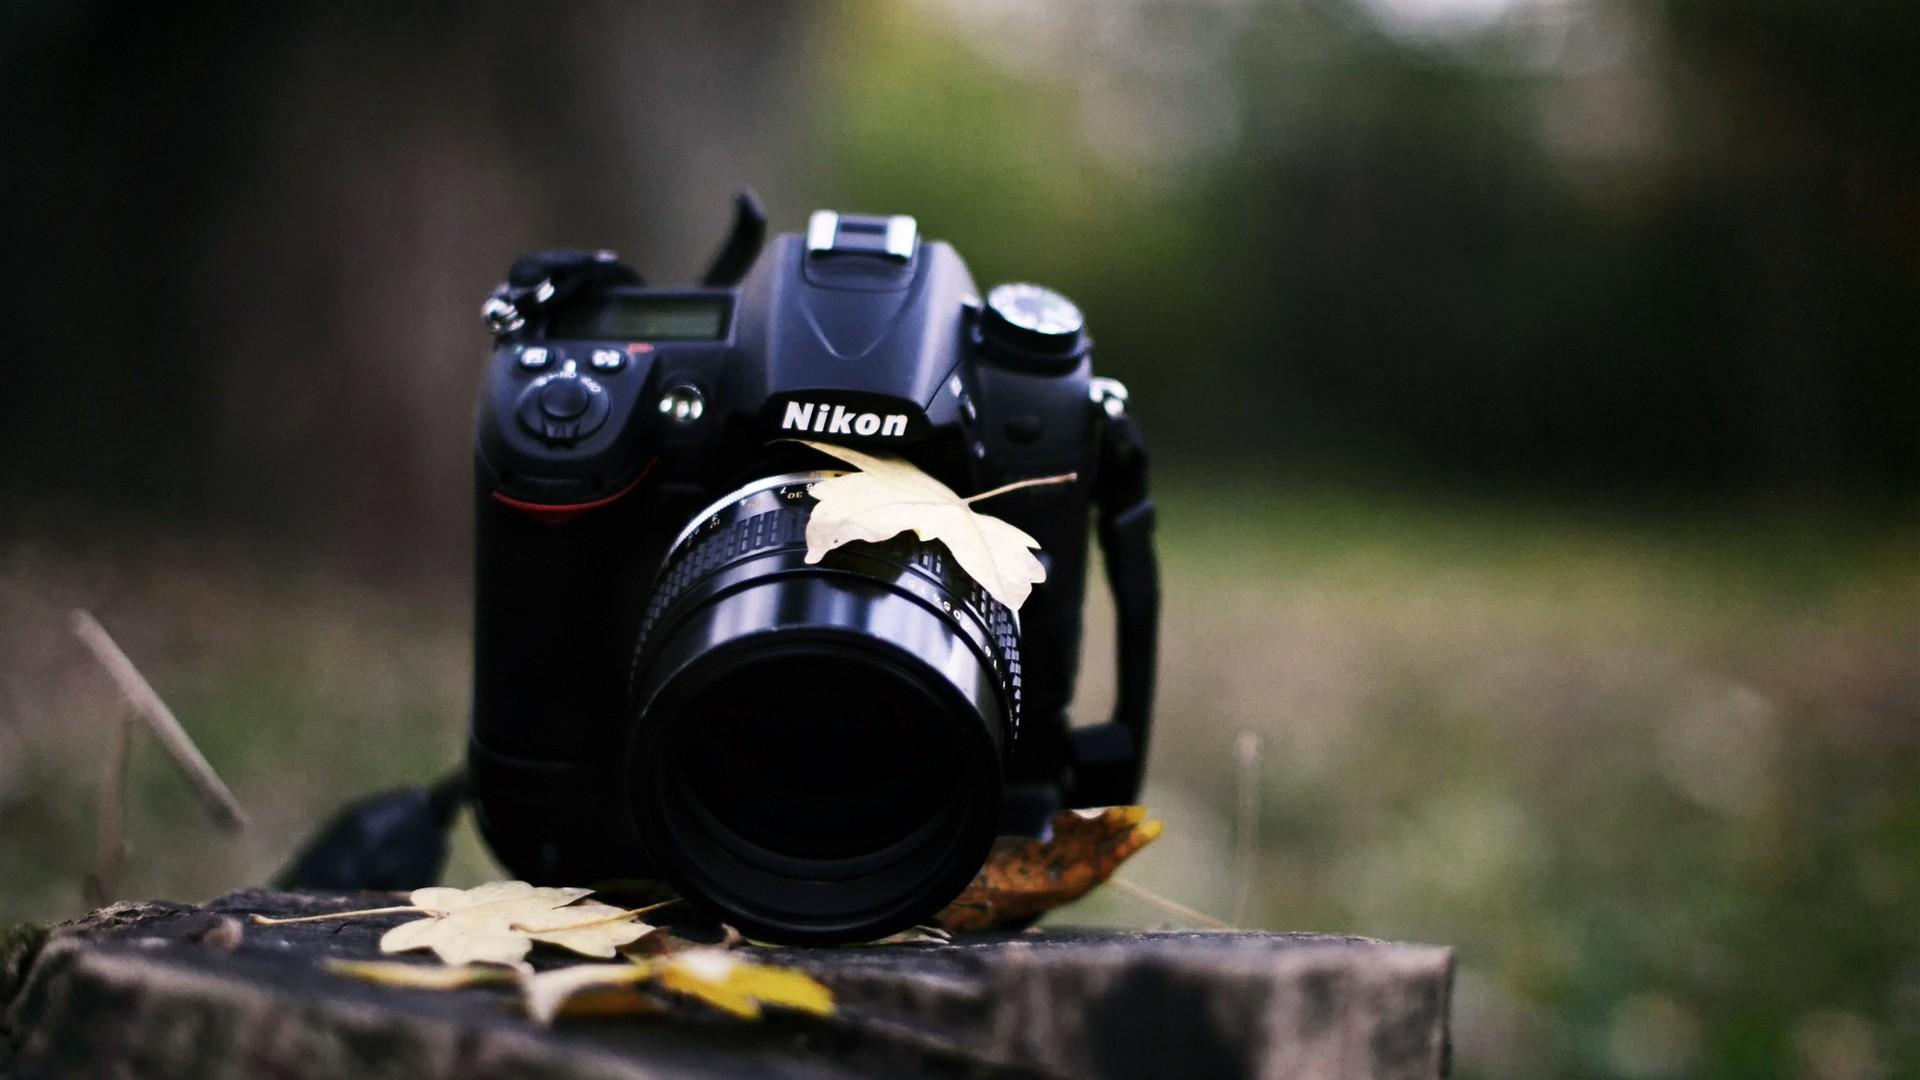 photography camera nikon wallpaper - photo #11